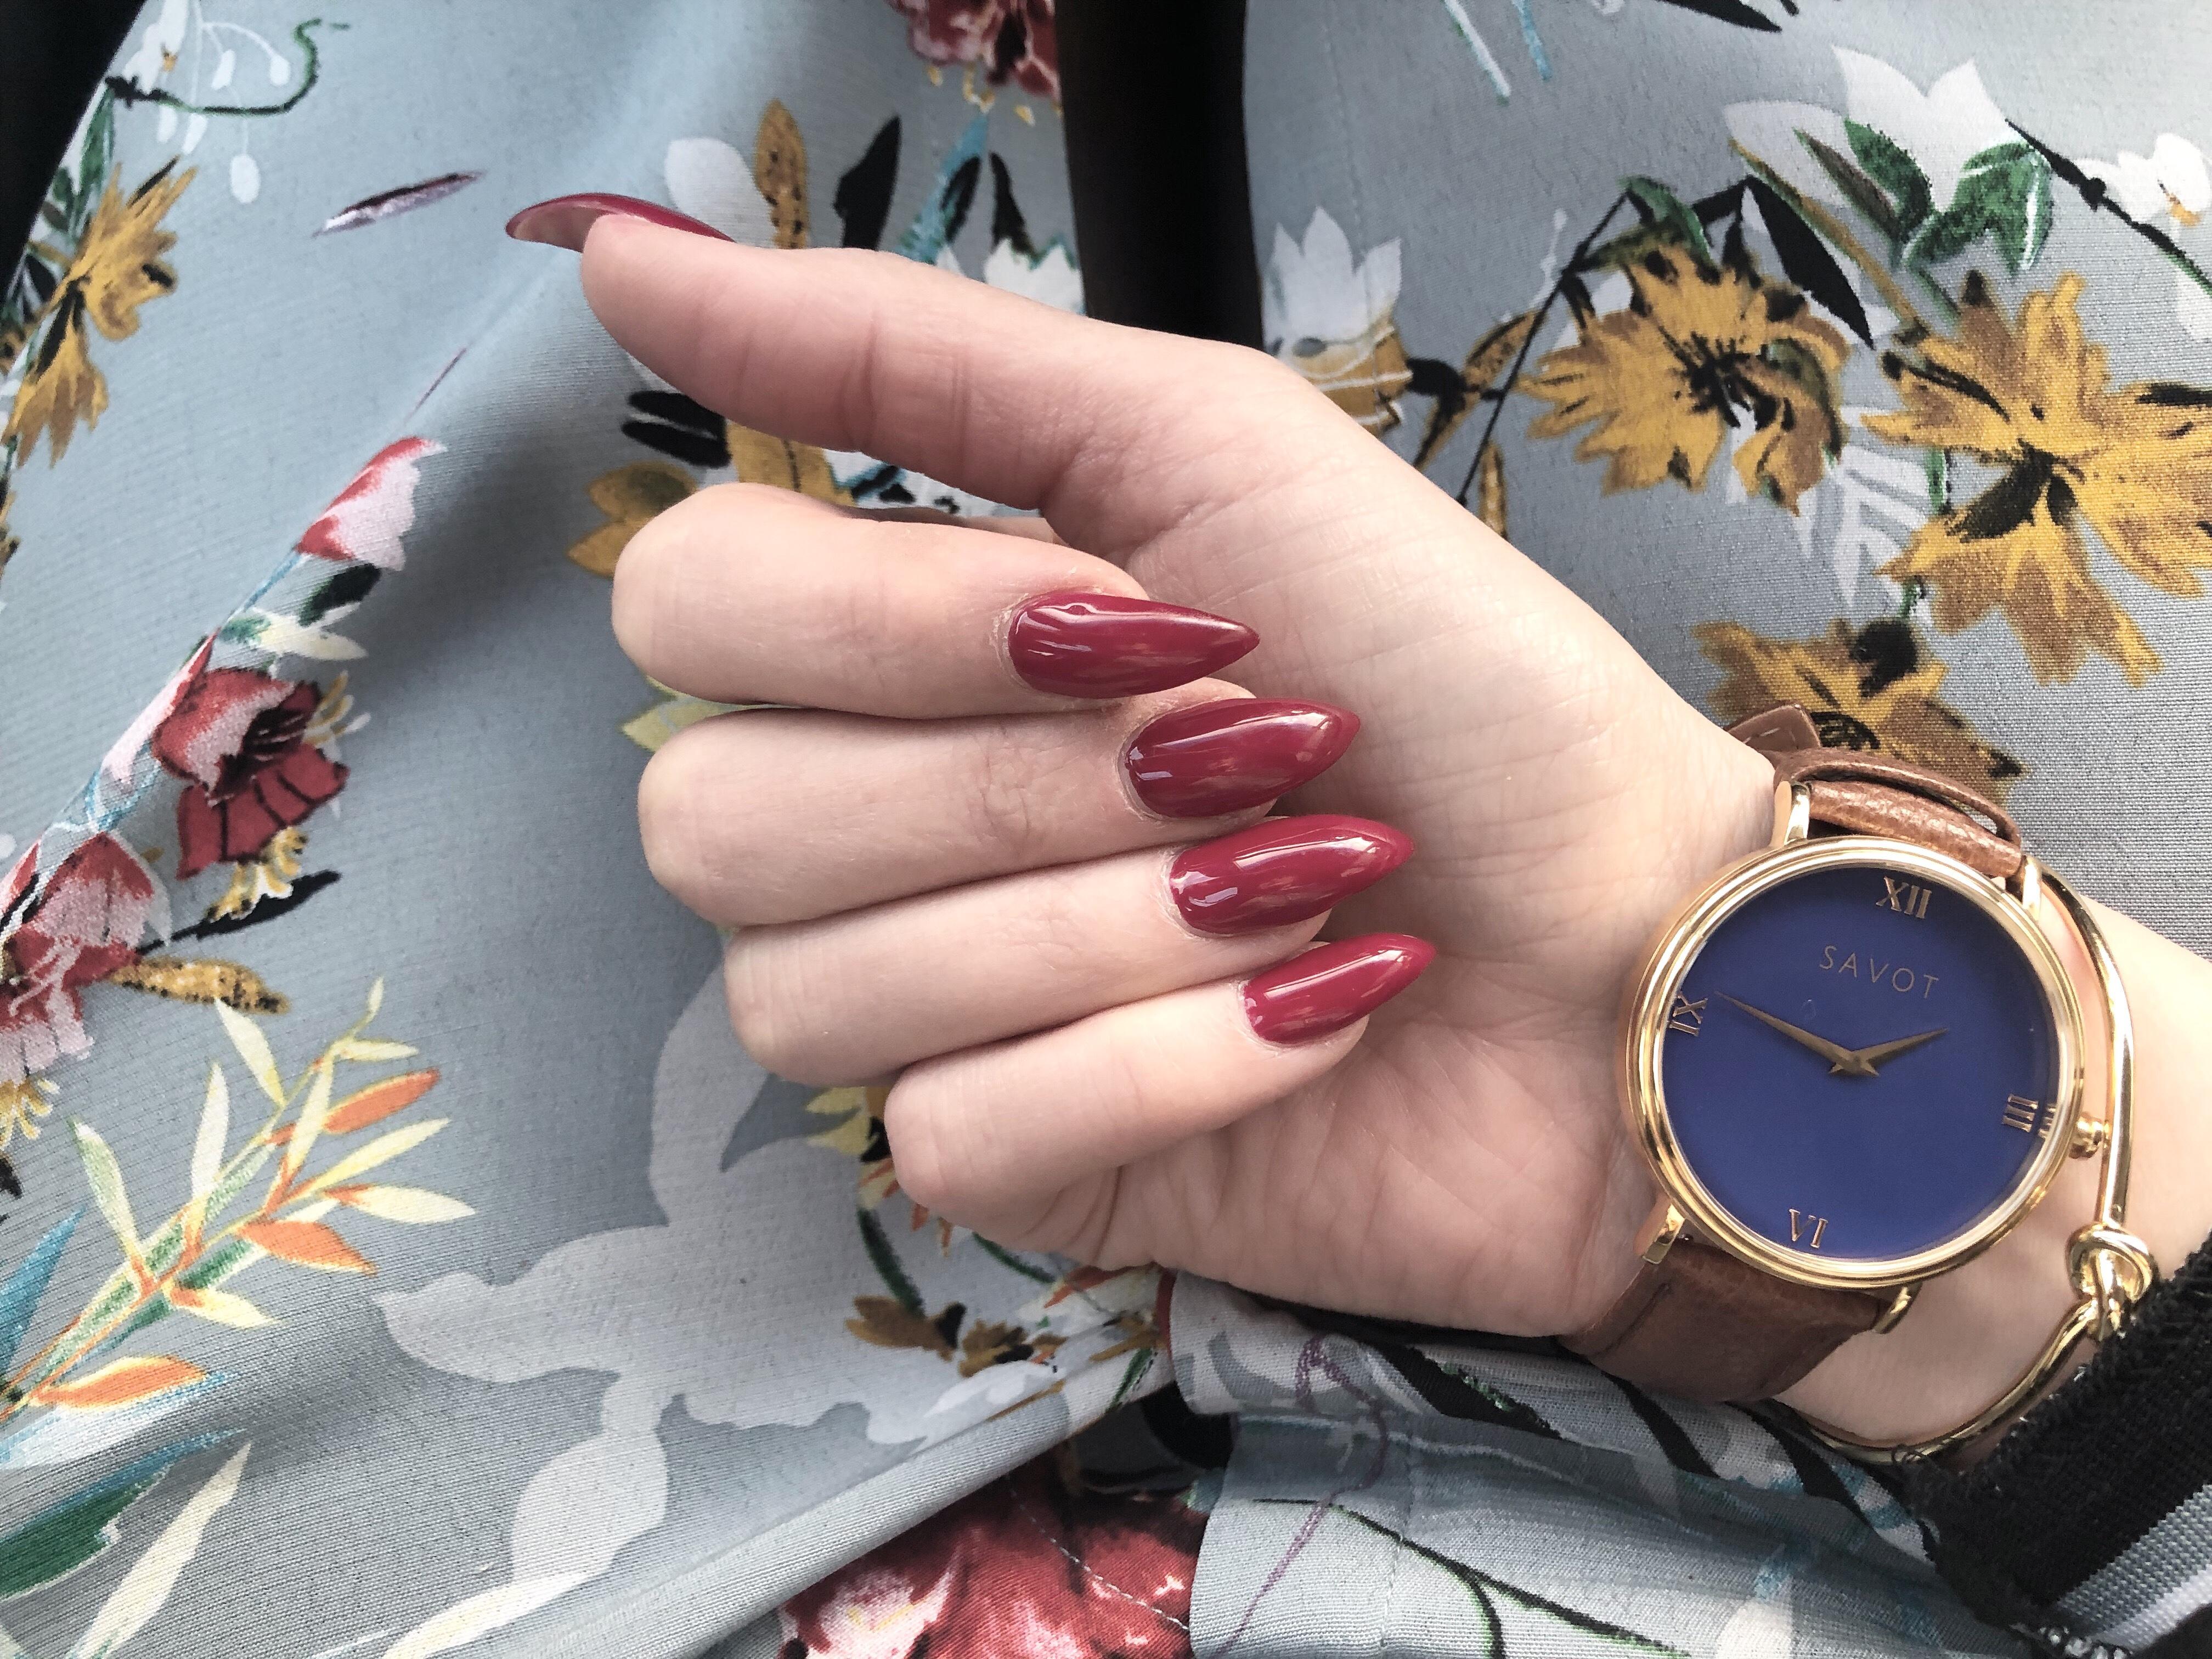 Dom perfekta röda naglarna